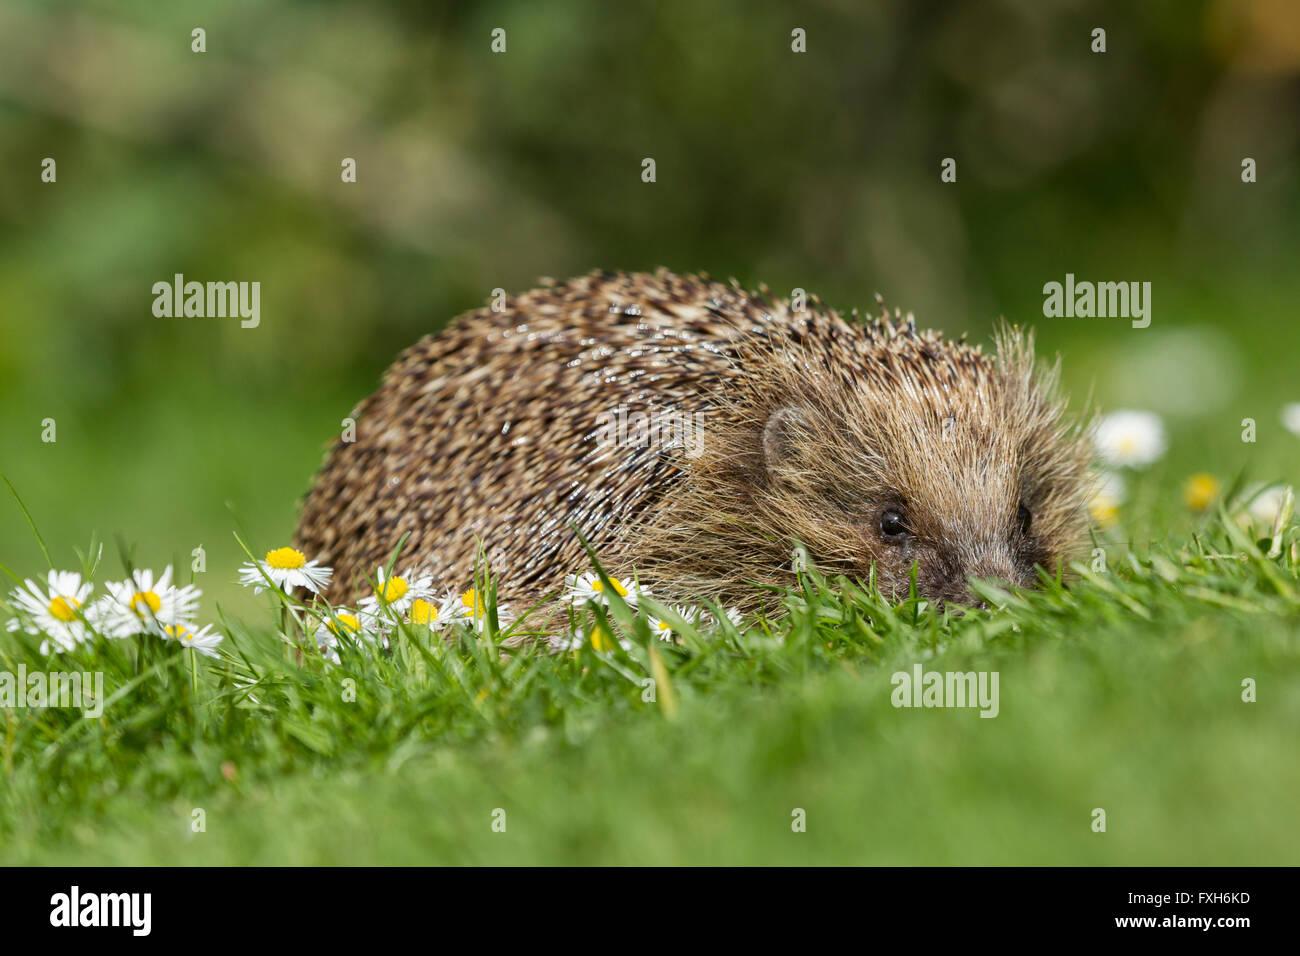 European hedgehog Erinaceus europaeus, adult male, curled up asleep in beech leaves, Knowle, West Midlands, UK in - Stock Image